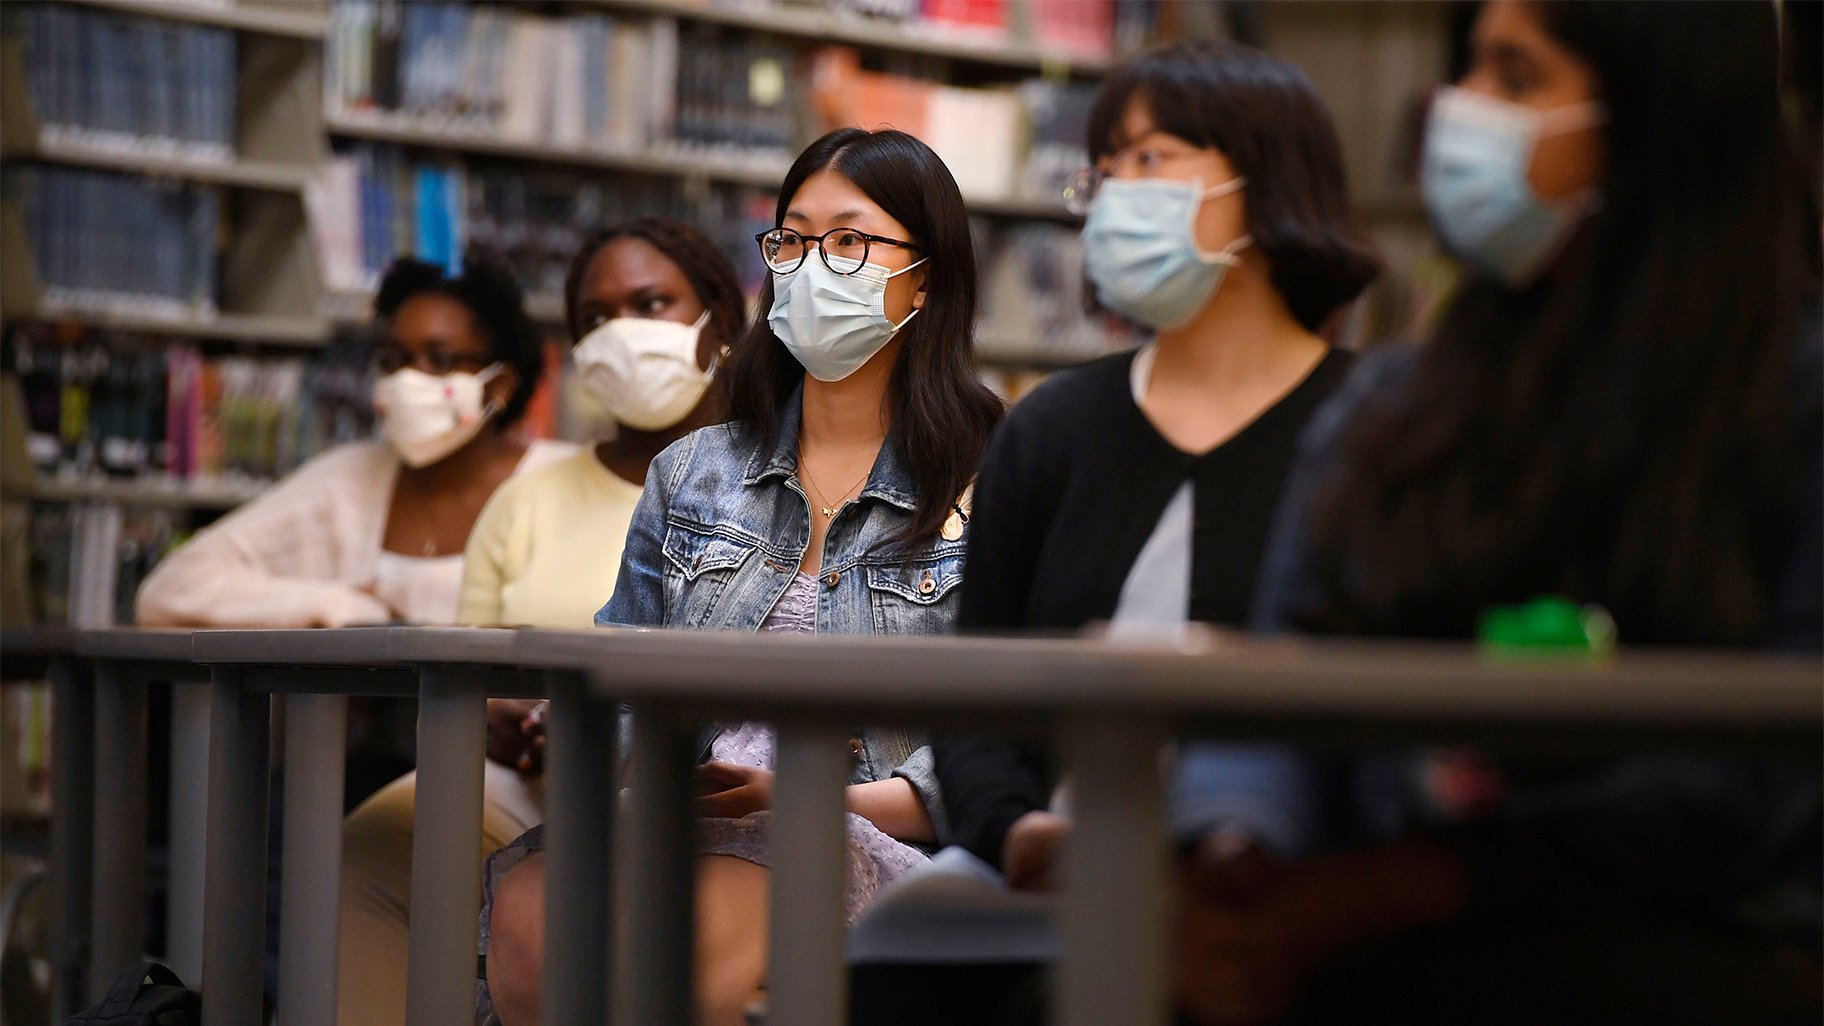 news.wttw.com: Legislators, Students Push for K-12 Asian American Studies